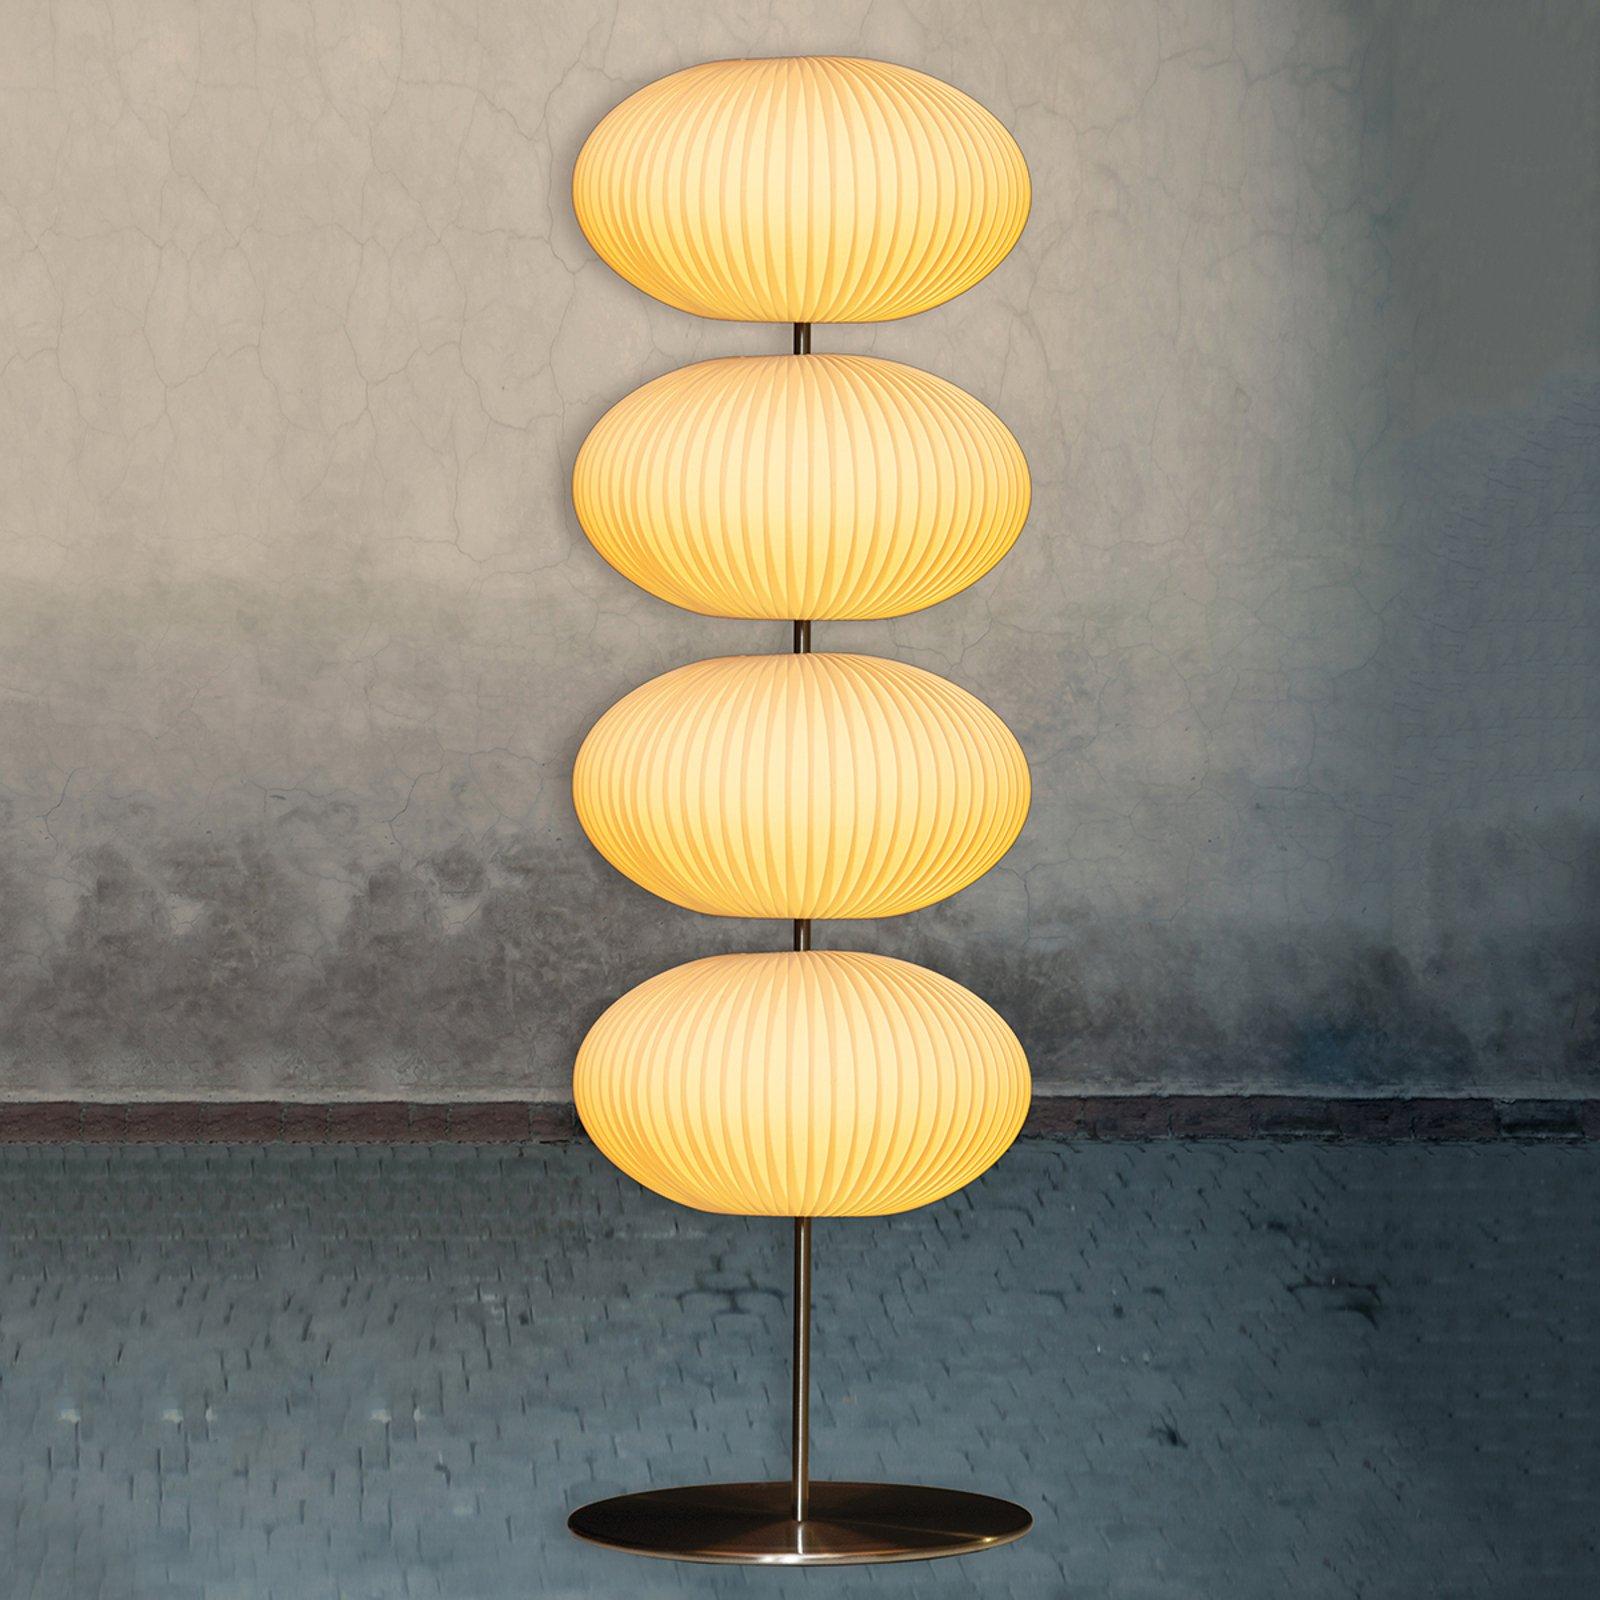 Palo gulvlampe med fire plisséskjermer